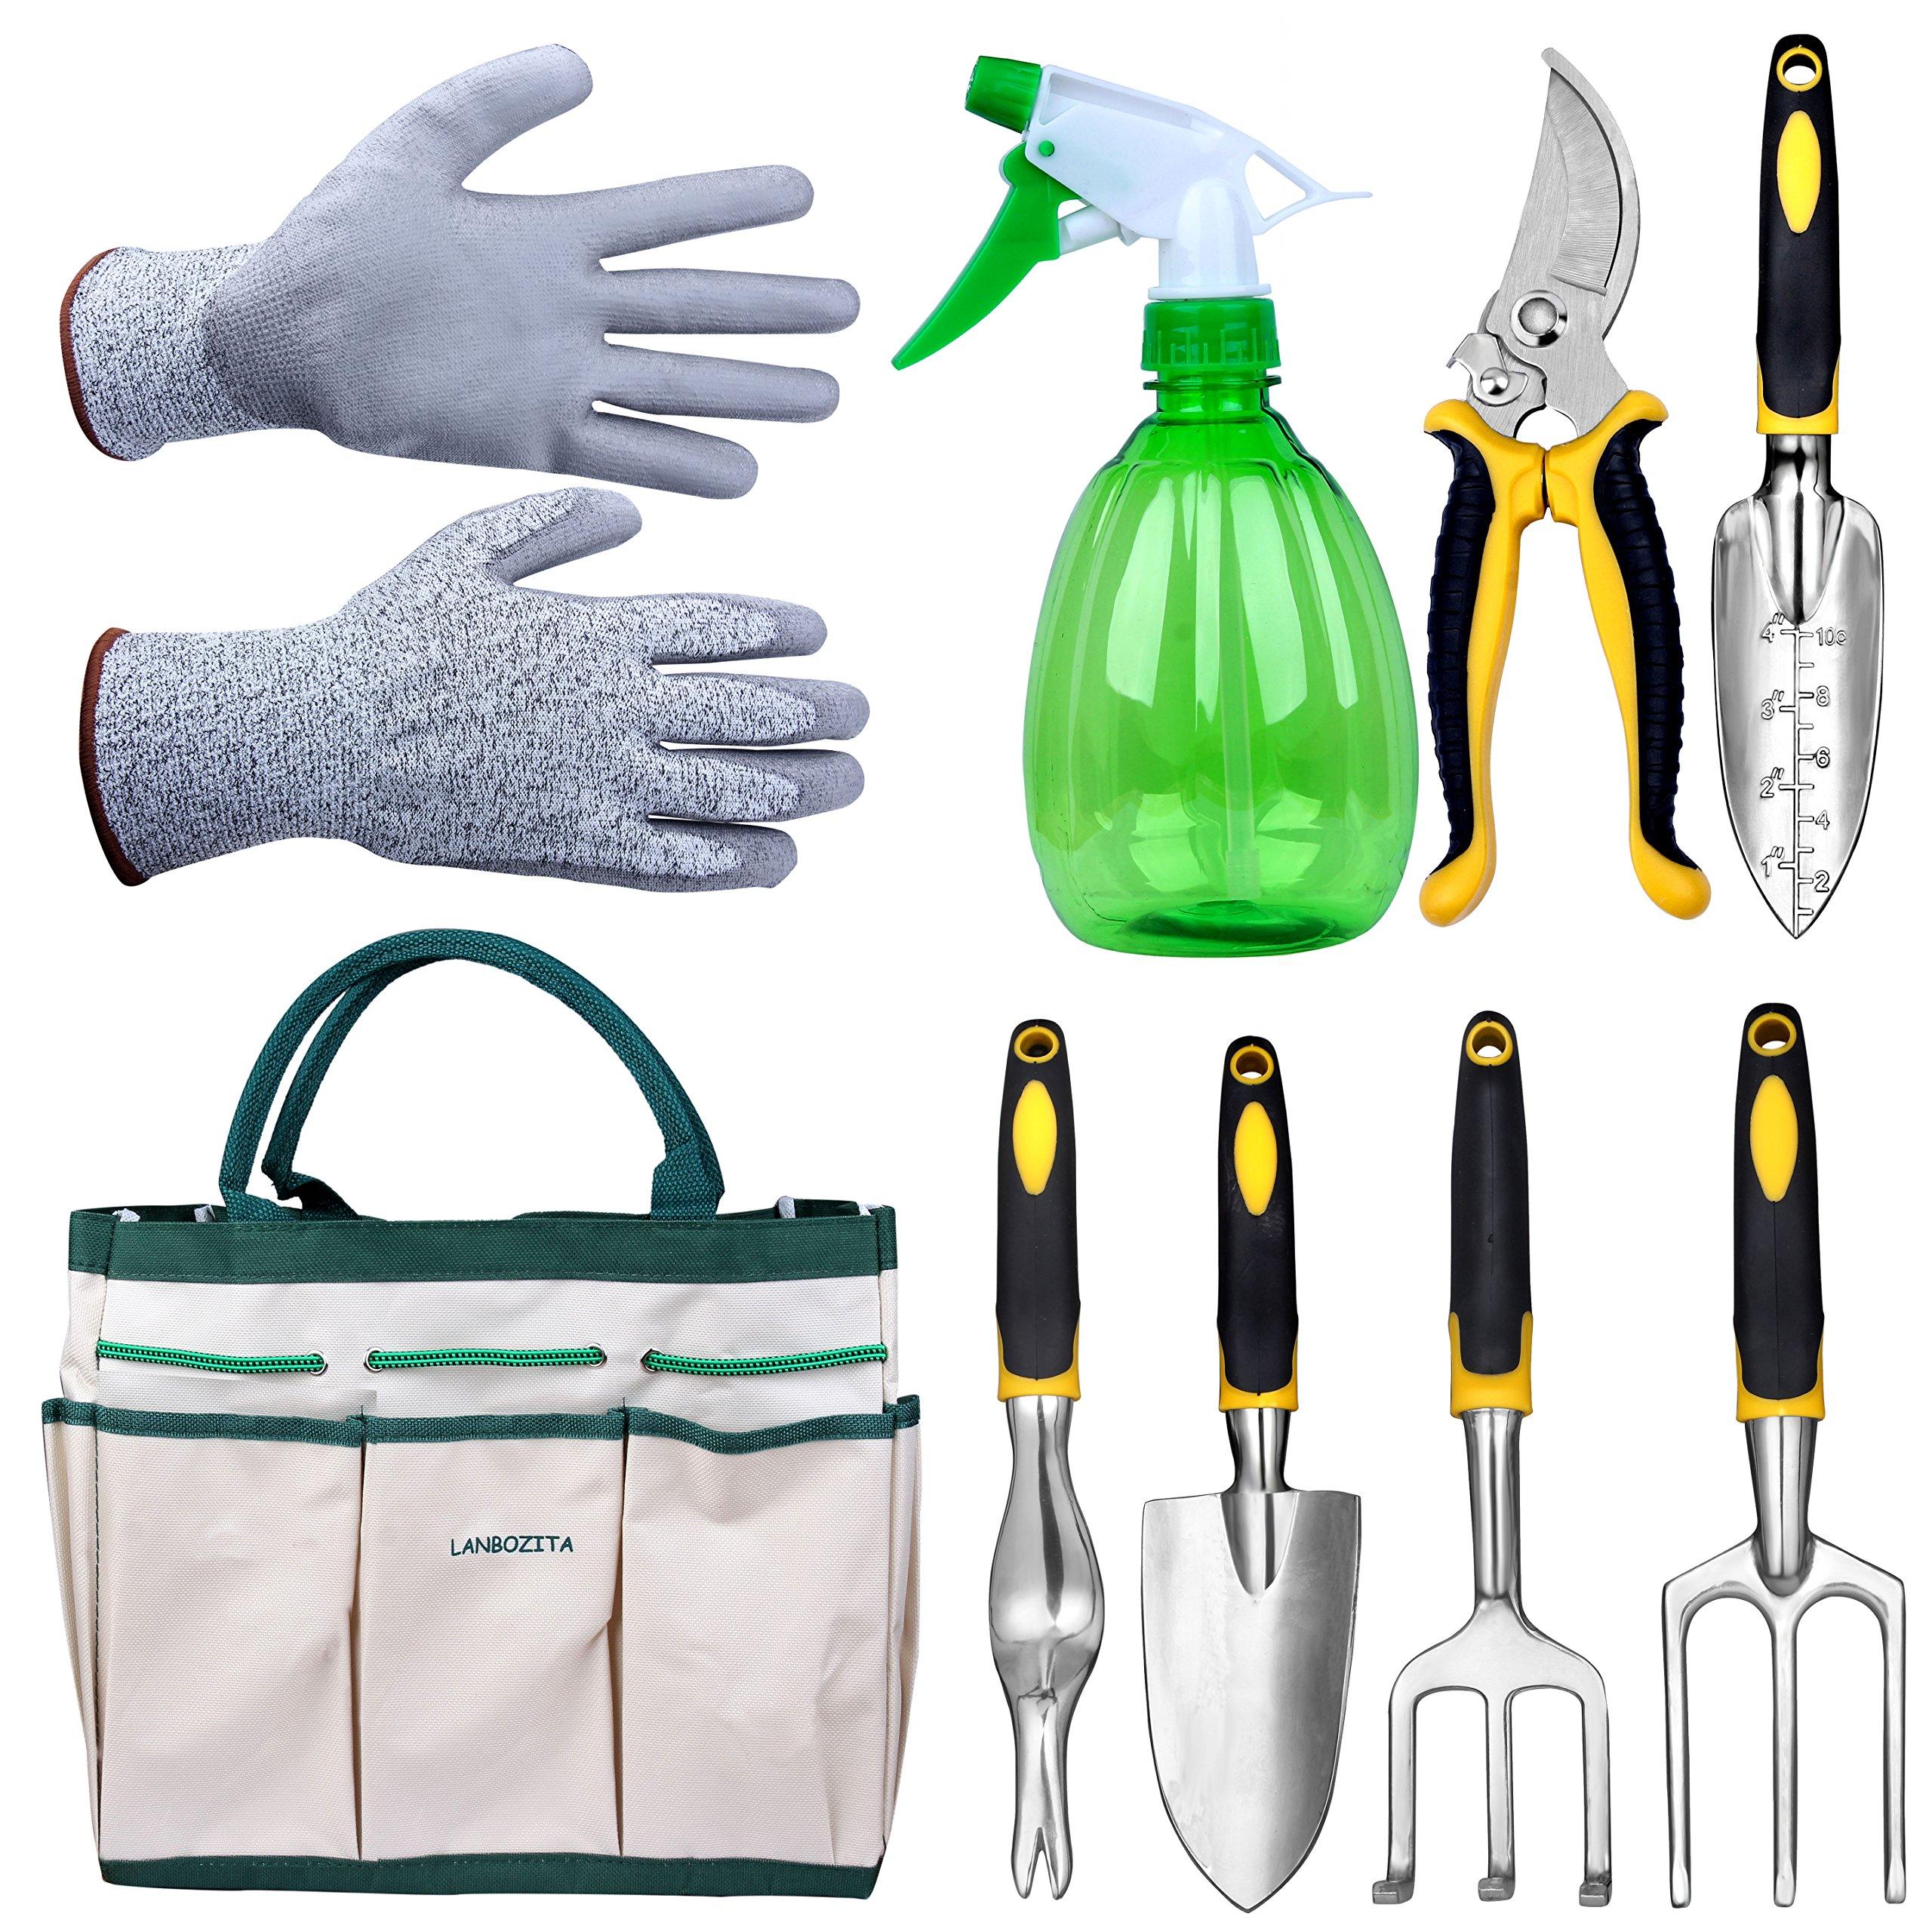 LANBOZITA Garden Tools